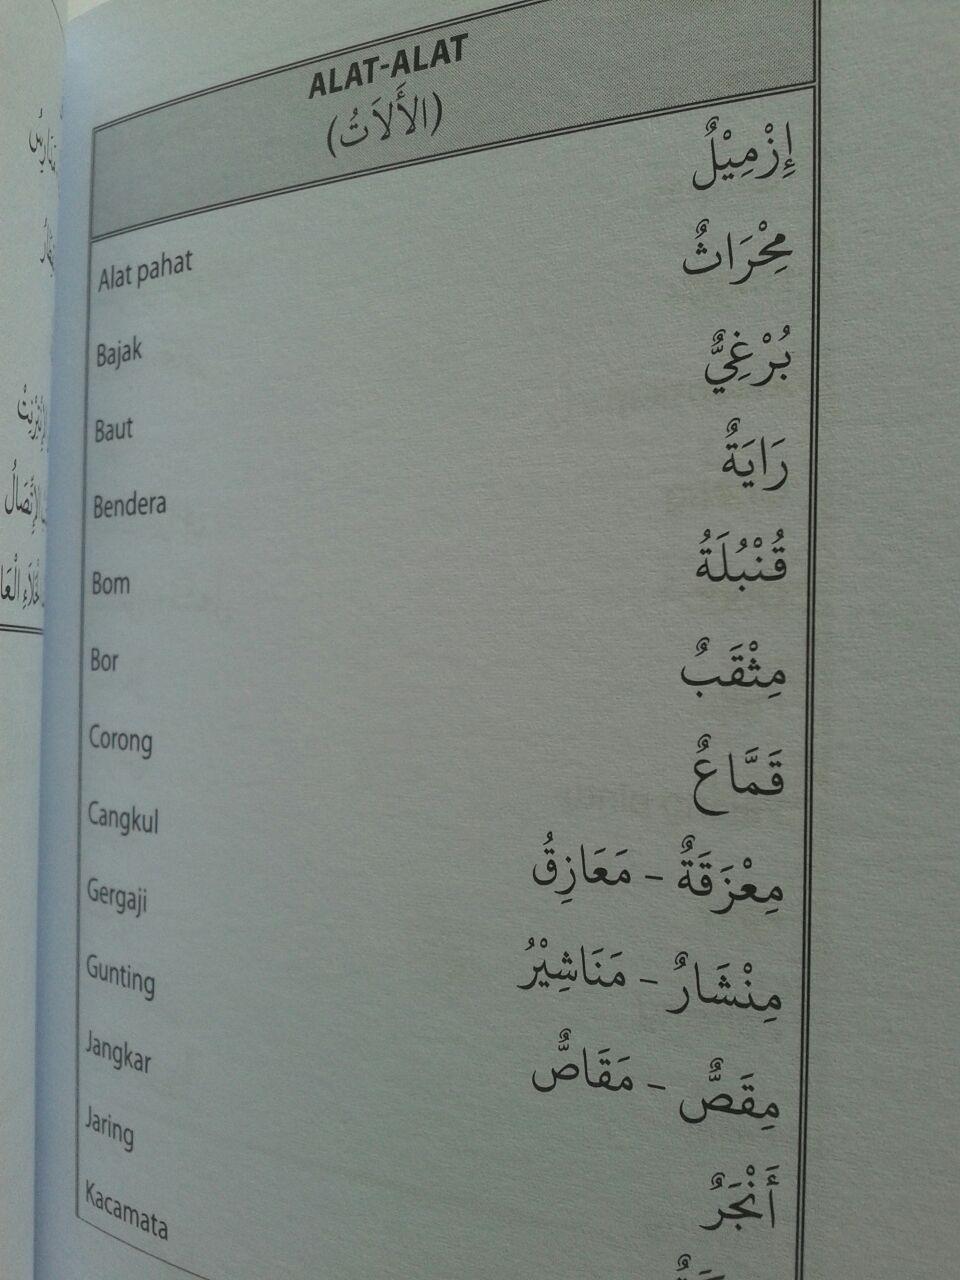 Buku Saku Kamus Santri Hebat Cepat Menguasai Bahasa Arab isi